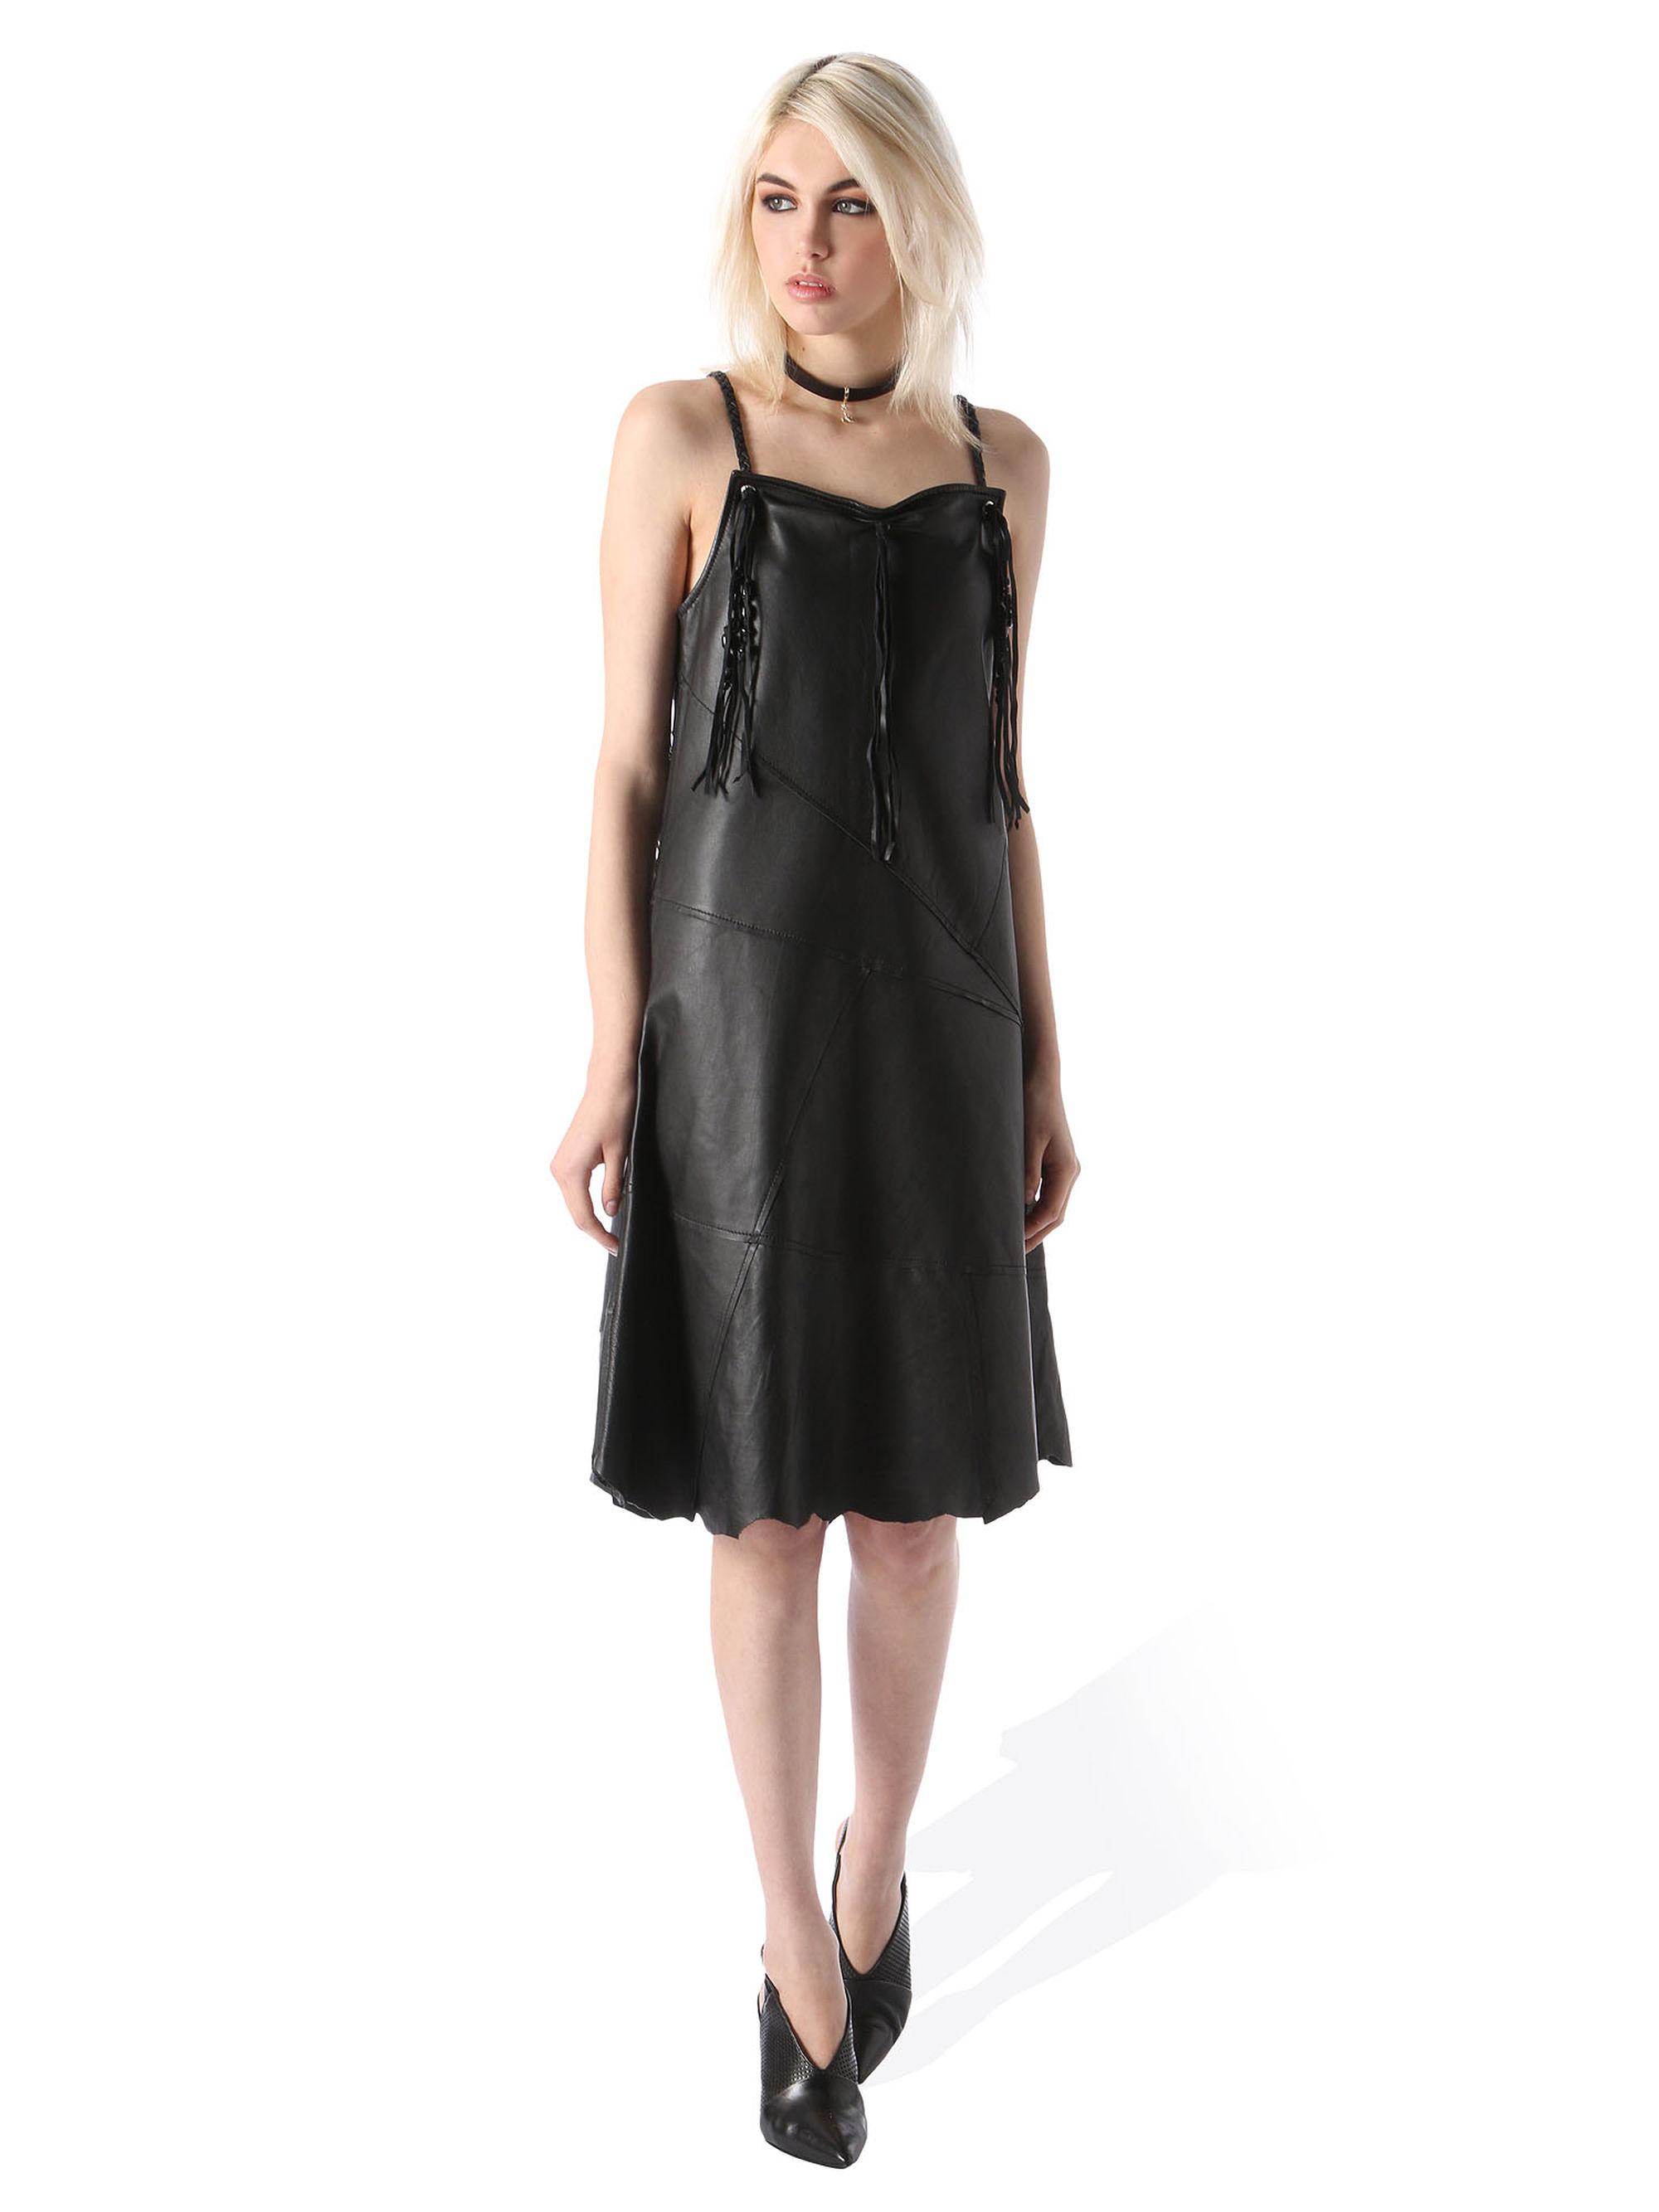 Next diesel black dress